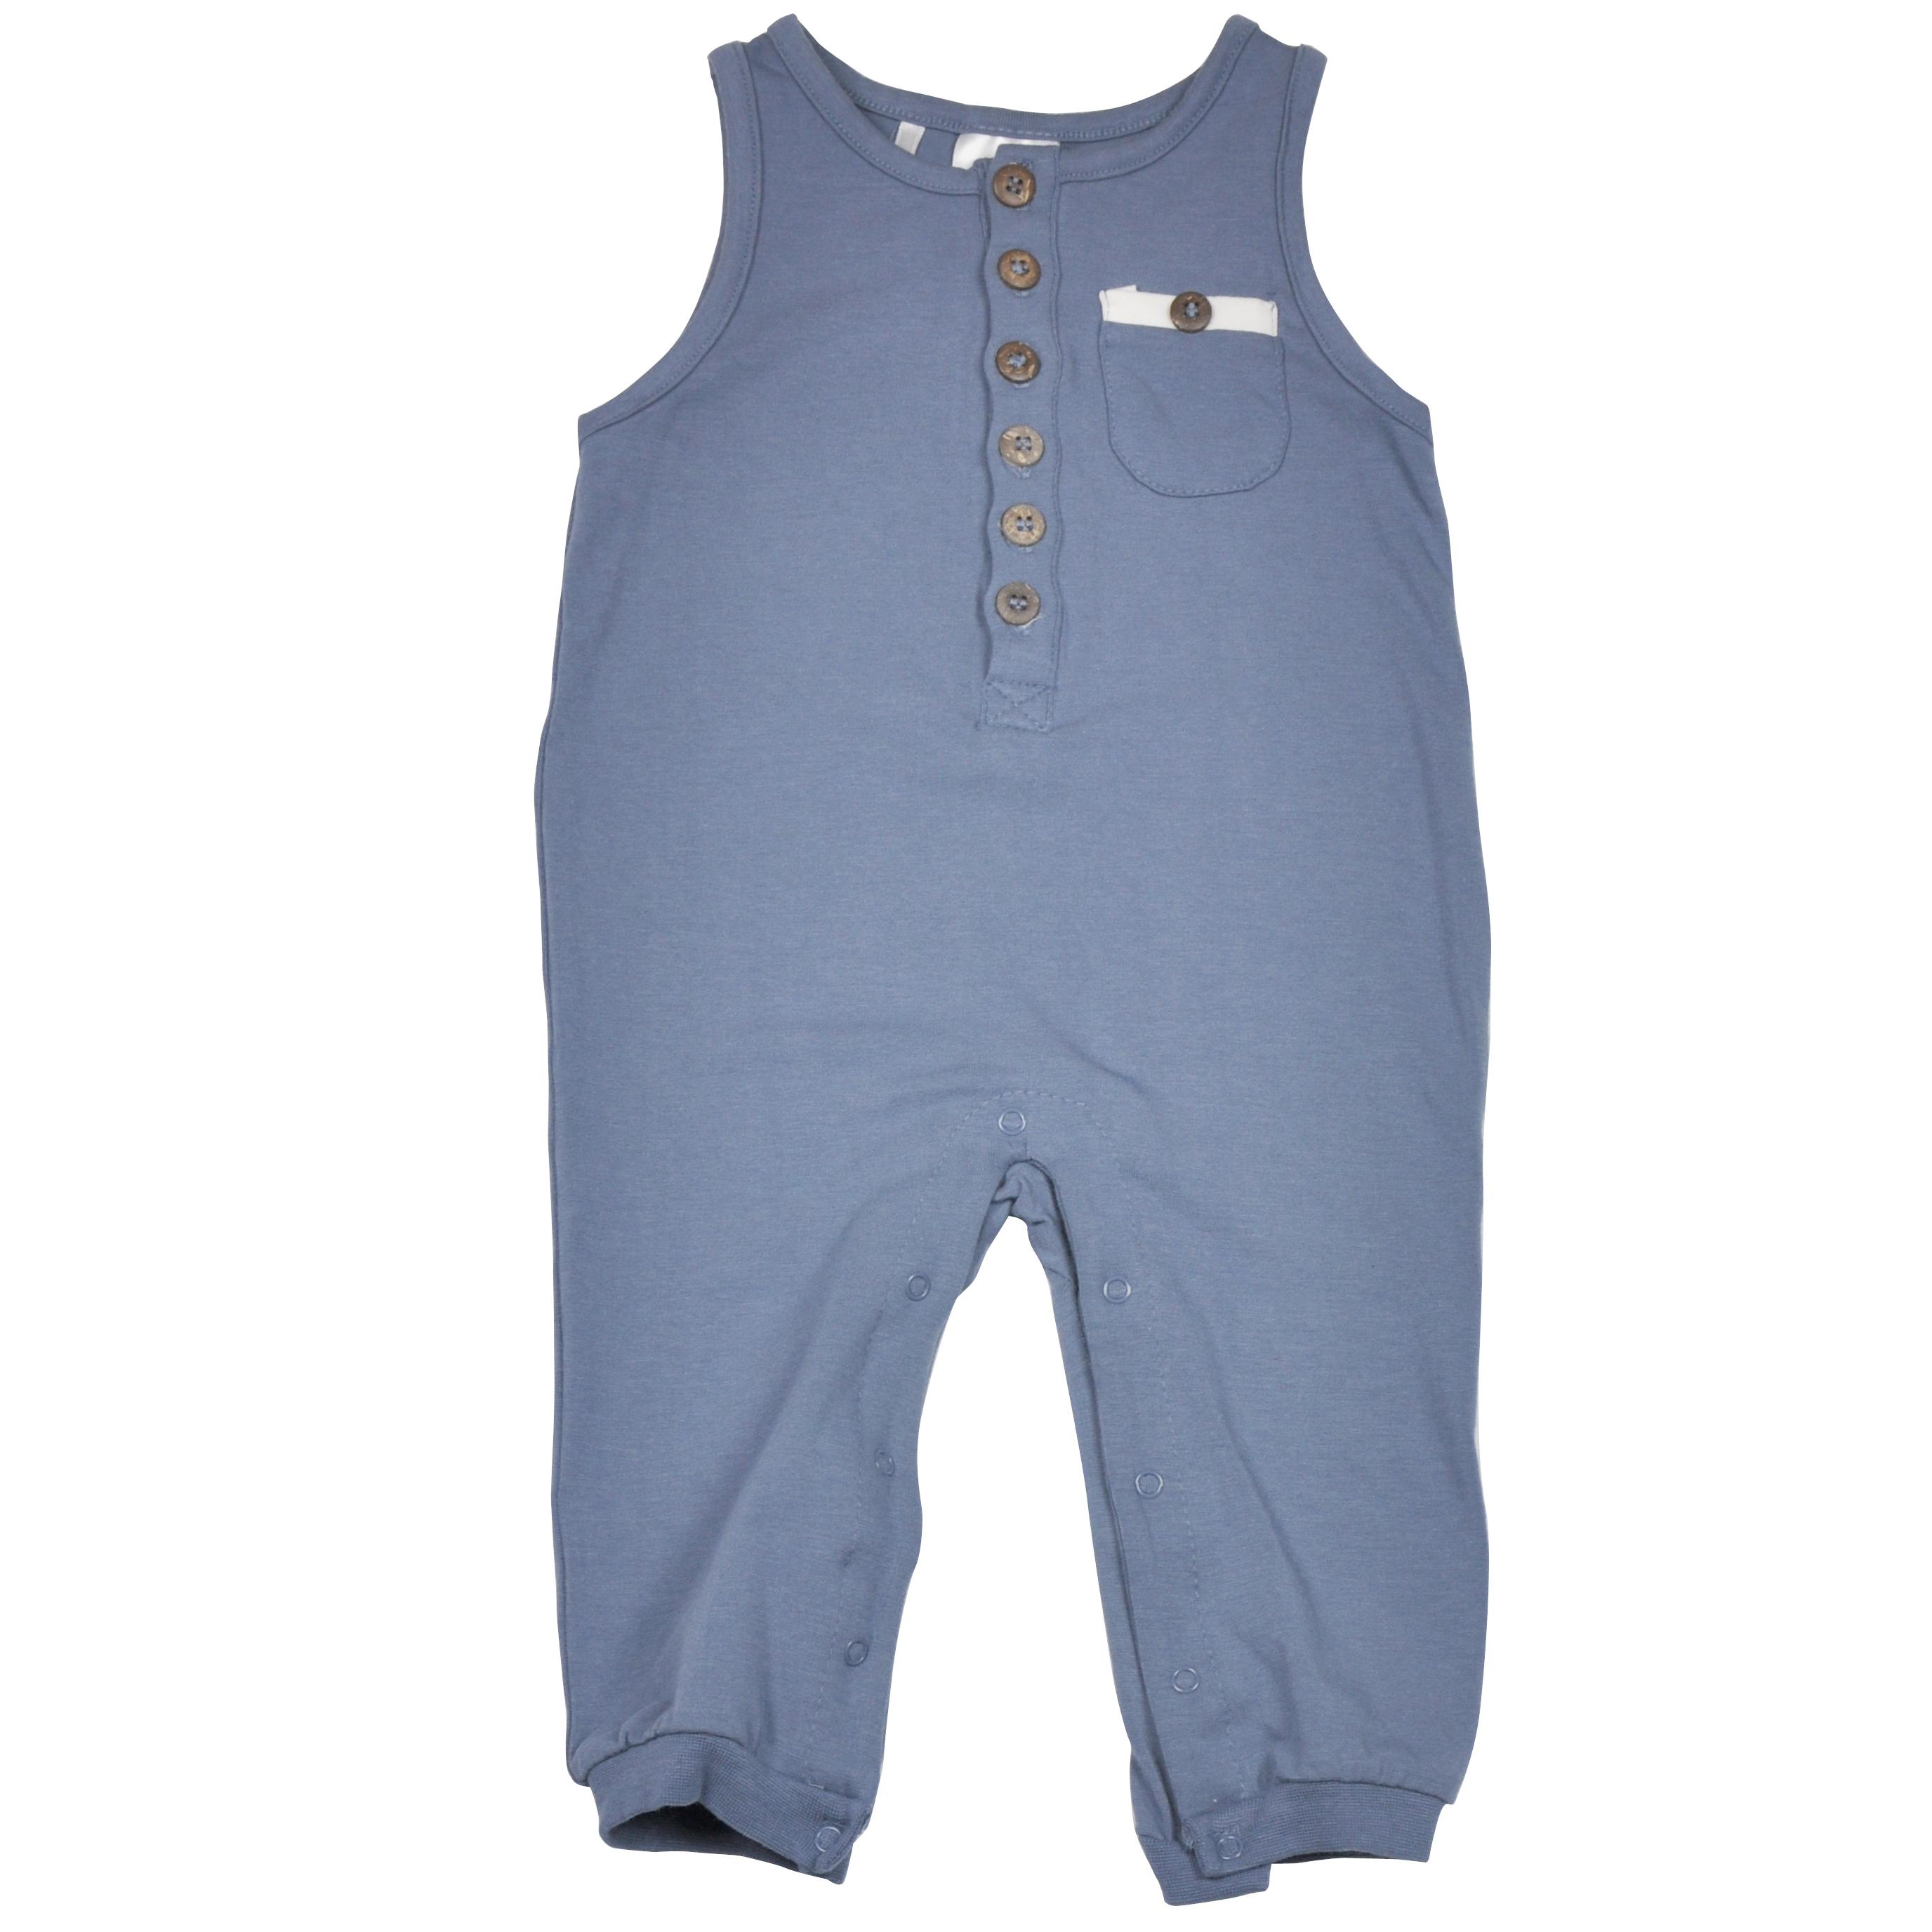 Støvet blå jumpsuit foran